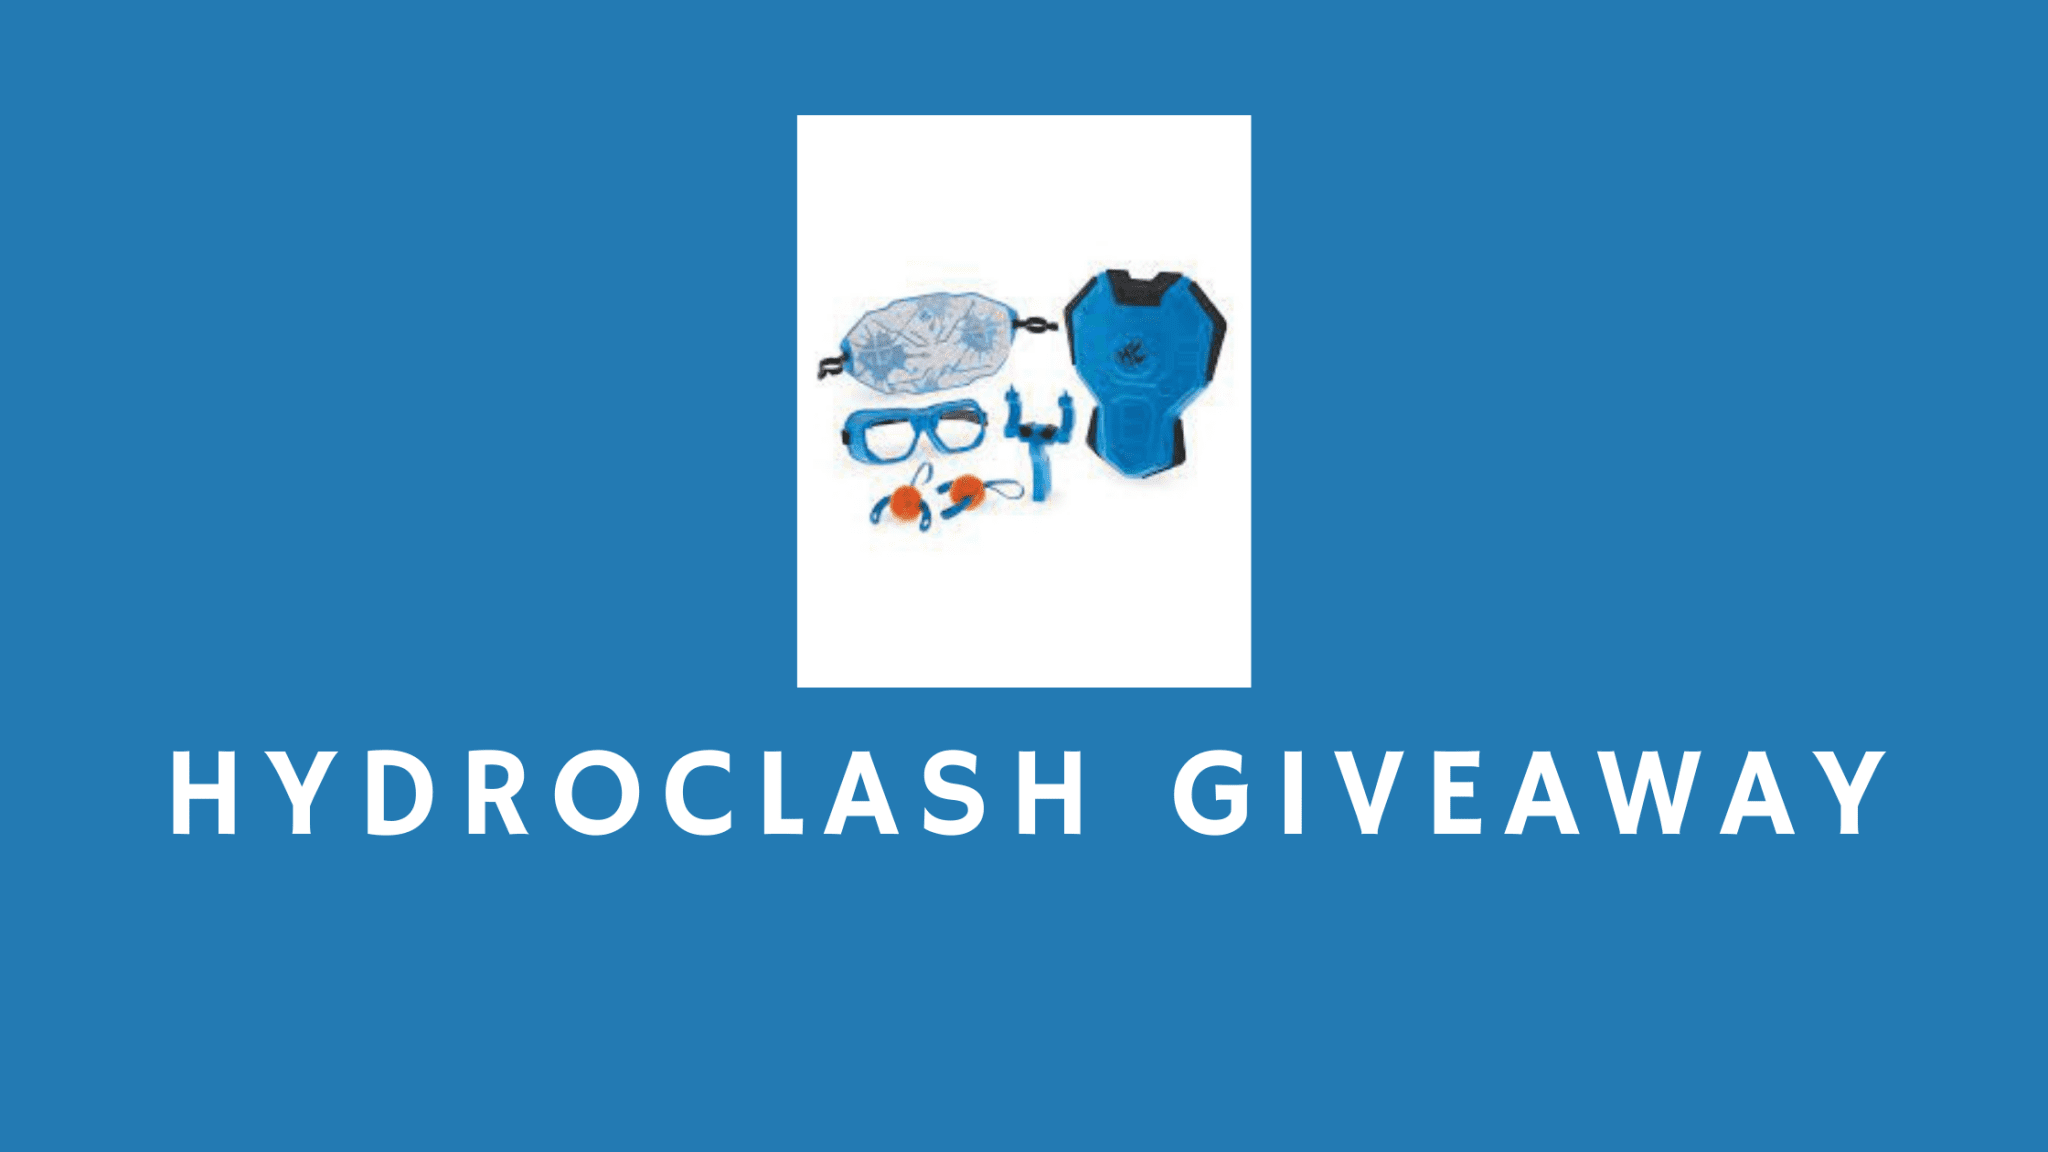 HydroClash Giveaway